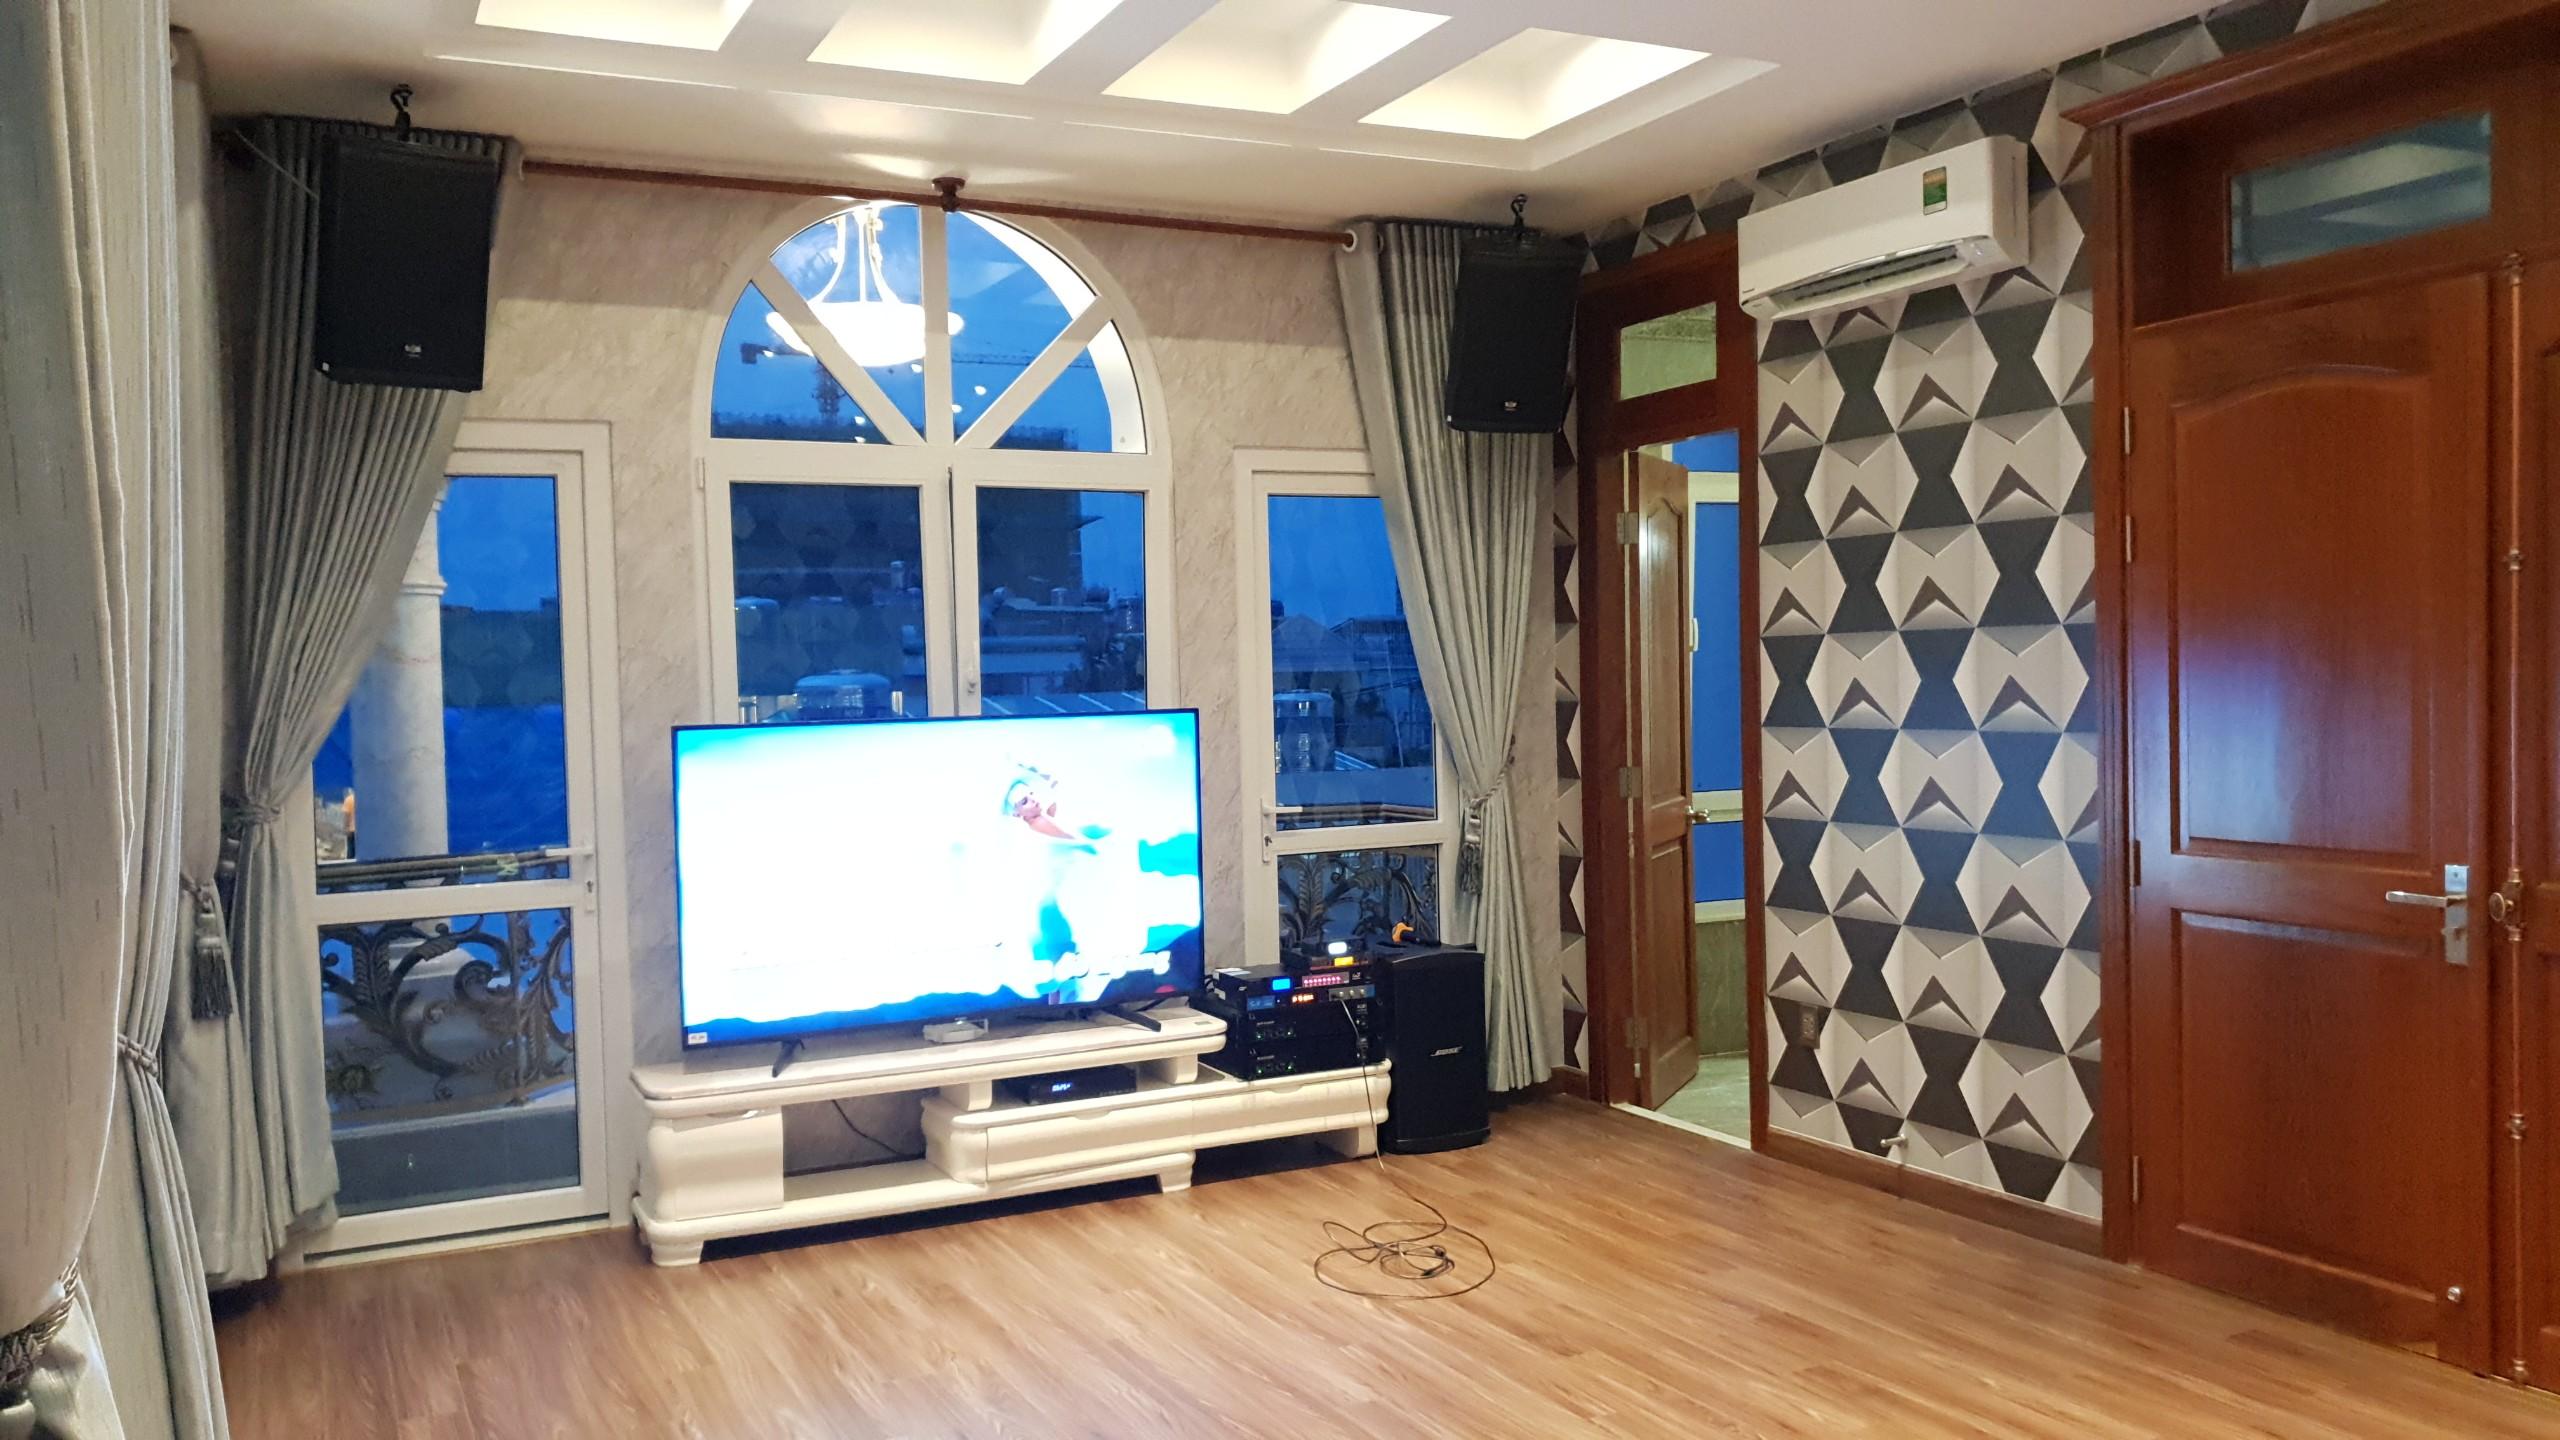 Giới thiệu dàn karaoke cao cấp TVAP 10